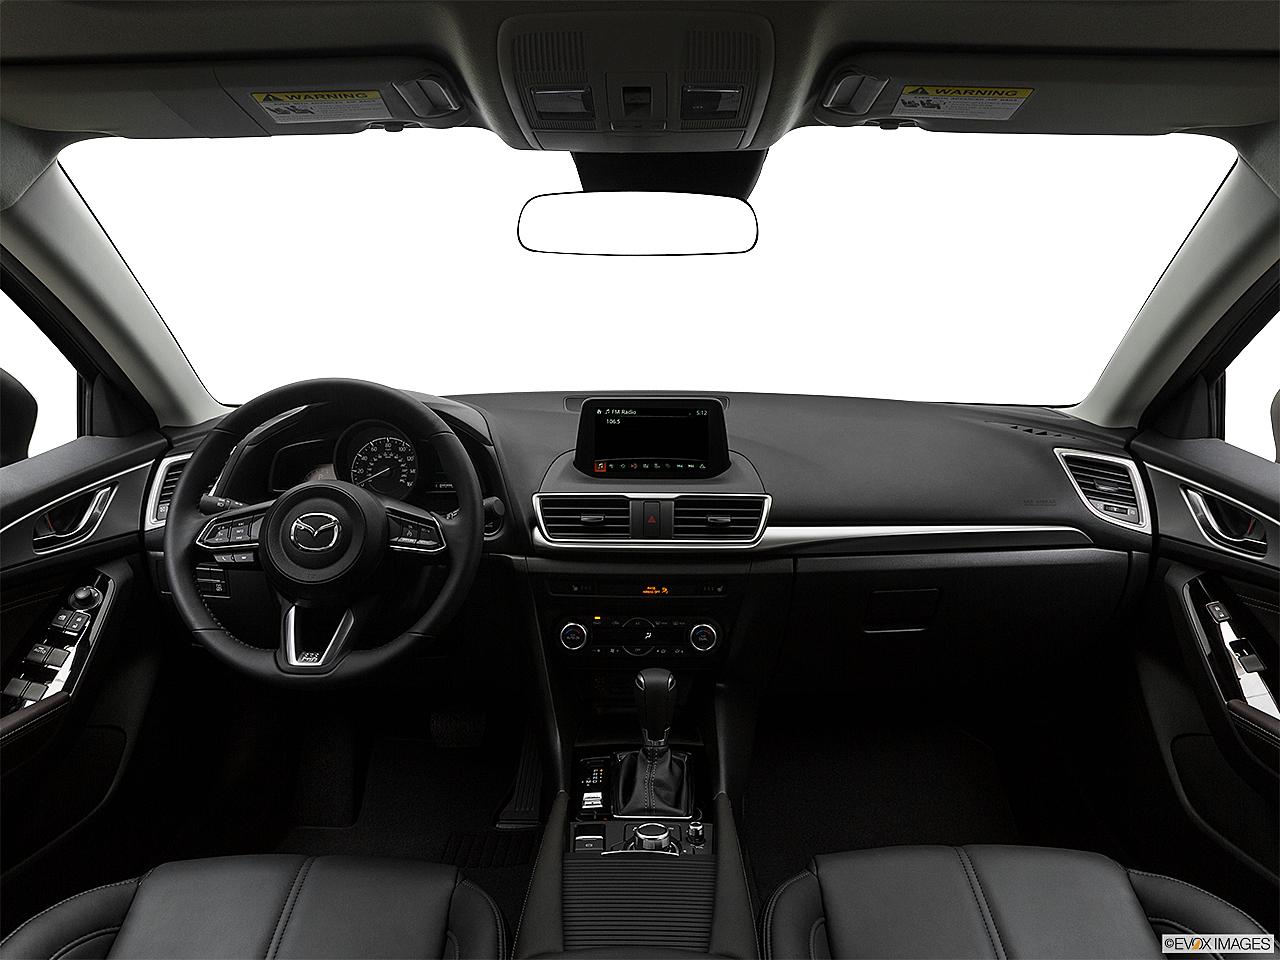 2017 Mazda Mazda3 Touring 2 5 Centered Wide Dash Shot